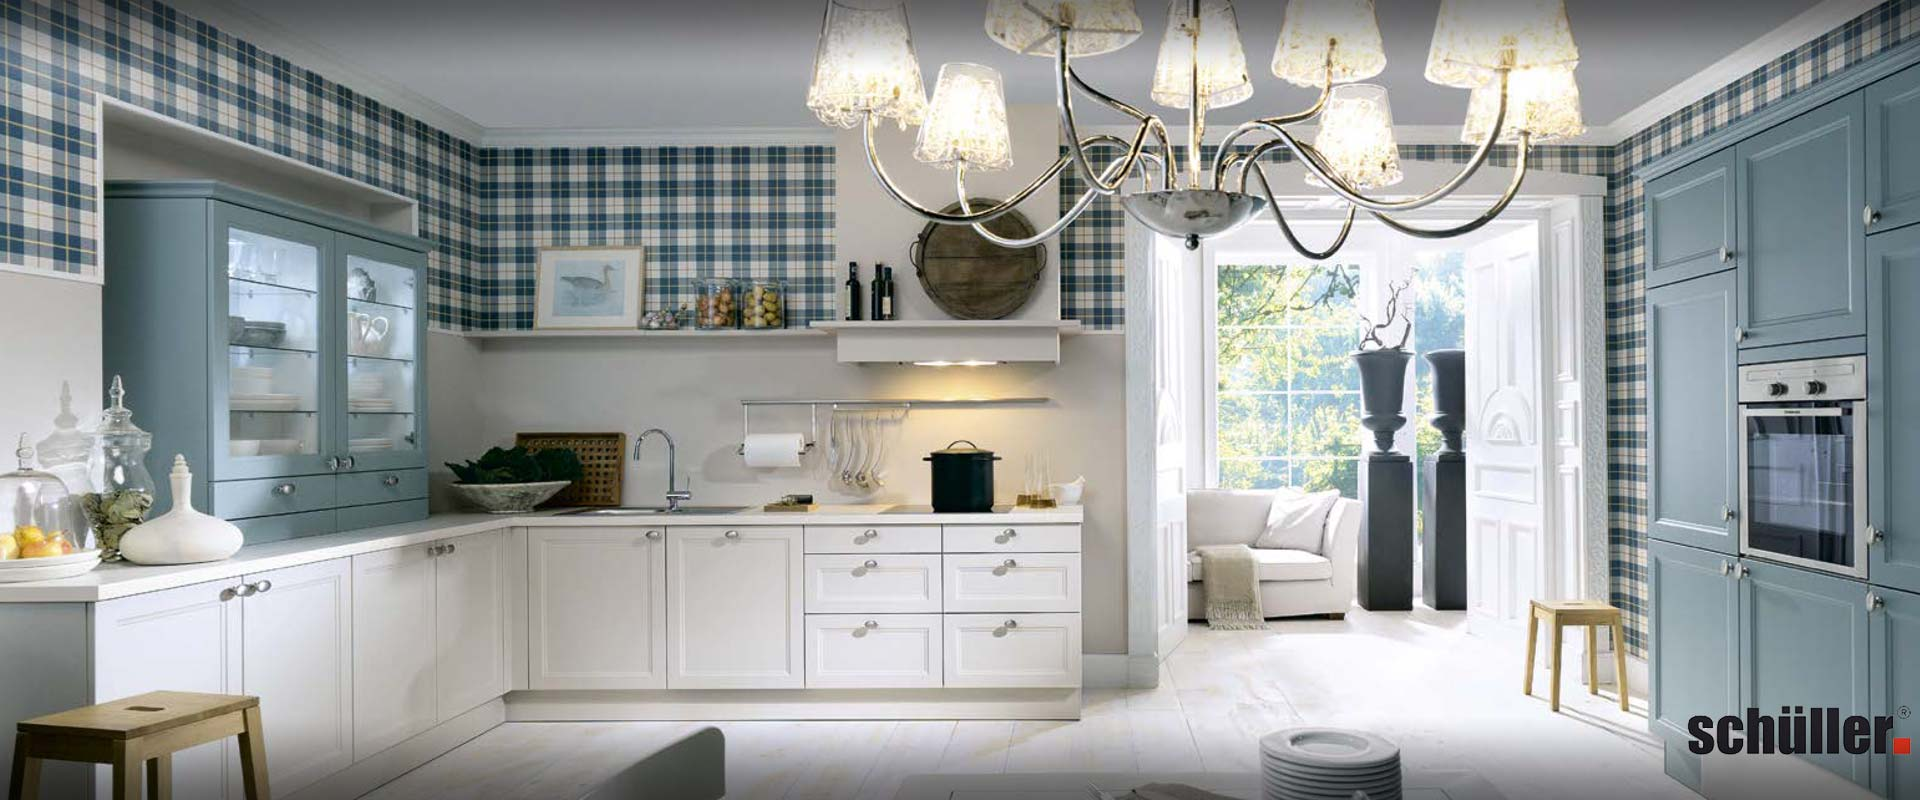 sch ller k chen st wendel bad kreuznach idar oberstein birkenfeld morbach bei k chen rech. Black Bedroom Furniture Sets. Home Design Ideas